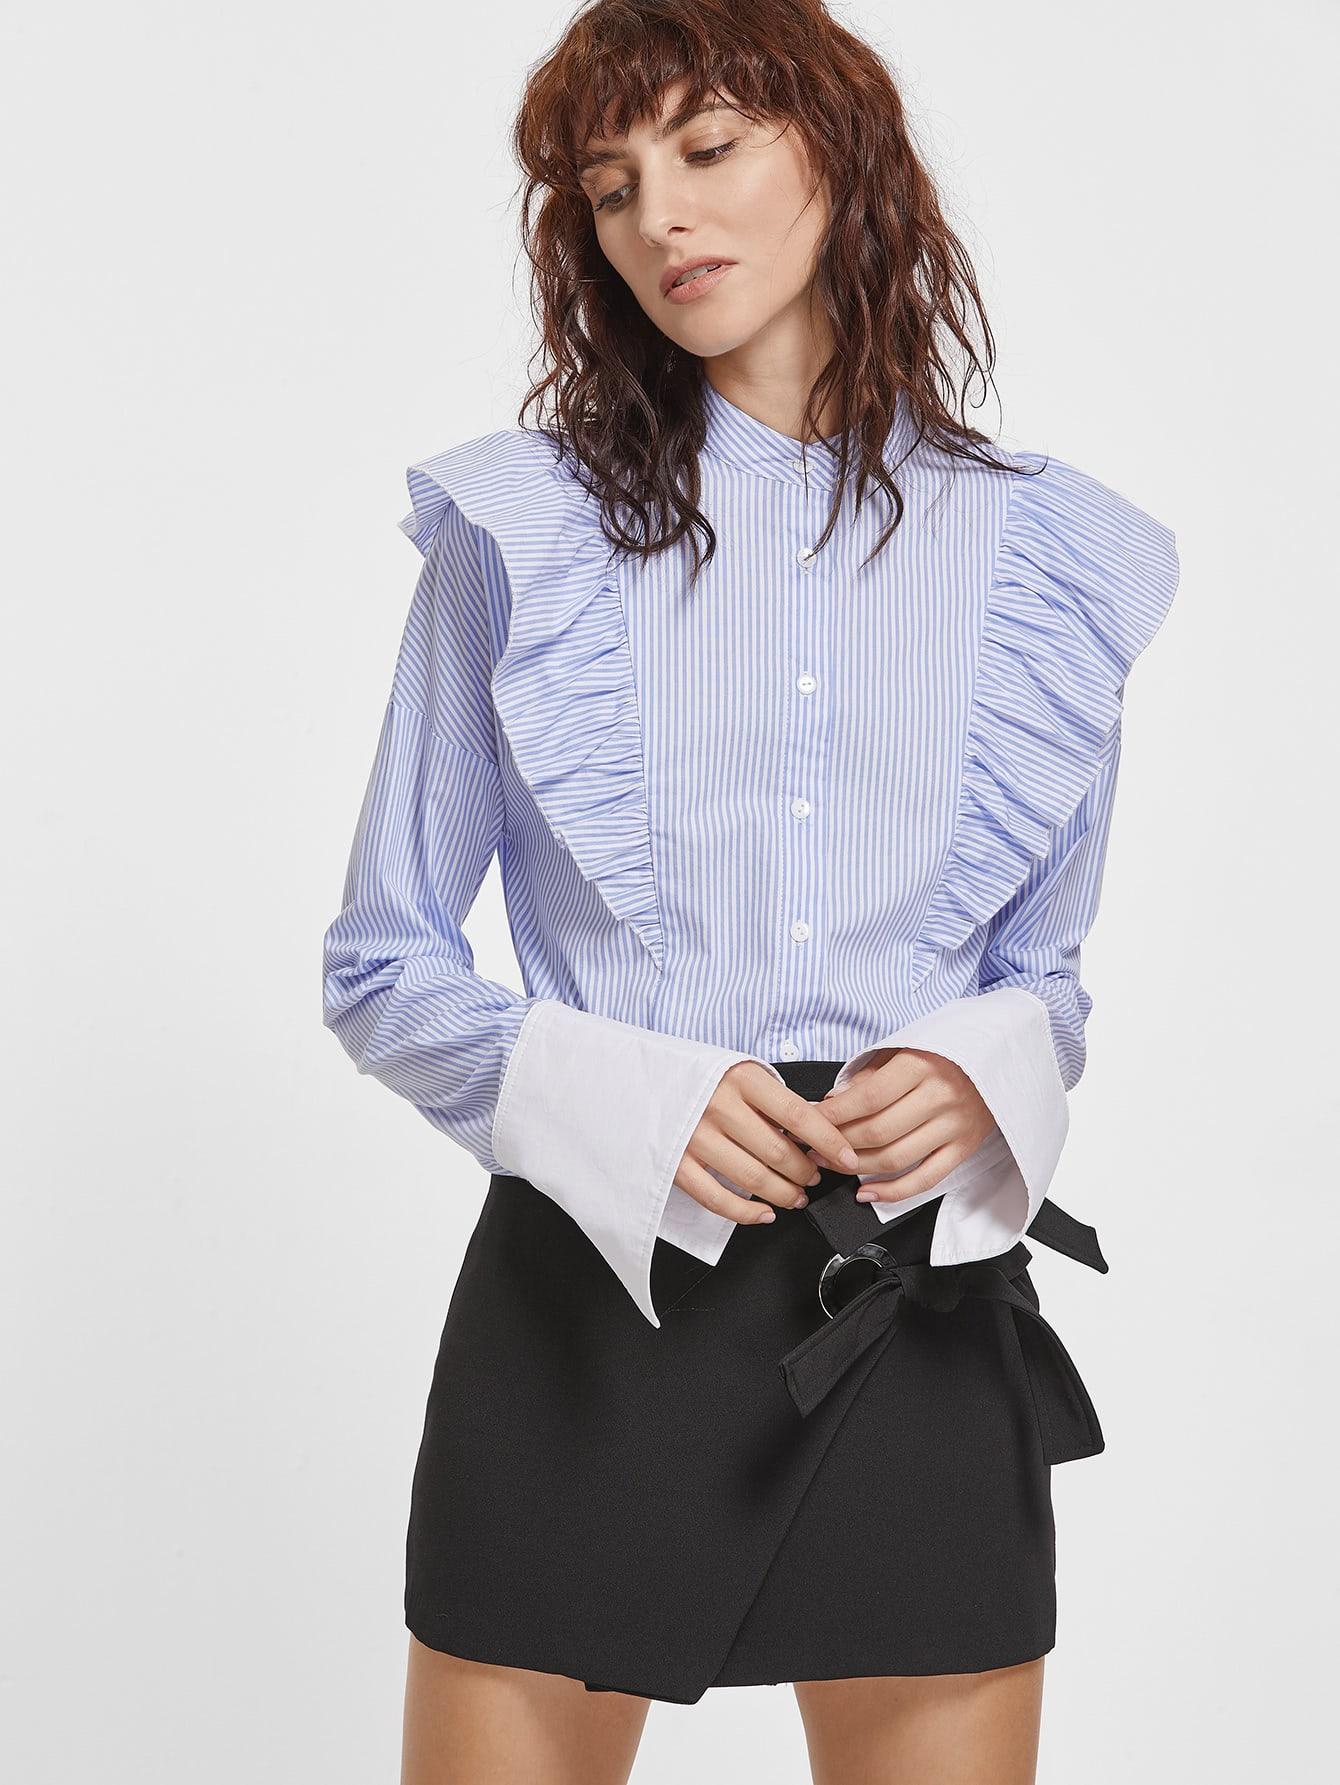 blouse161202708_2